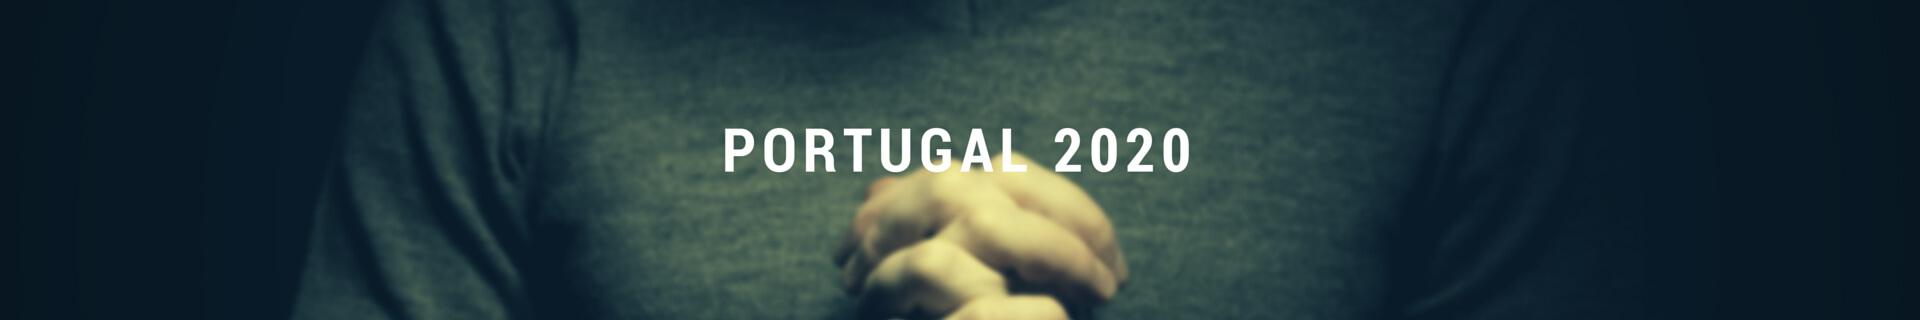 slider-portugal